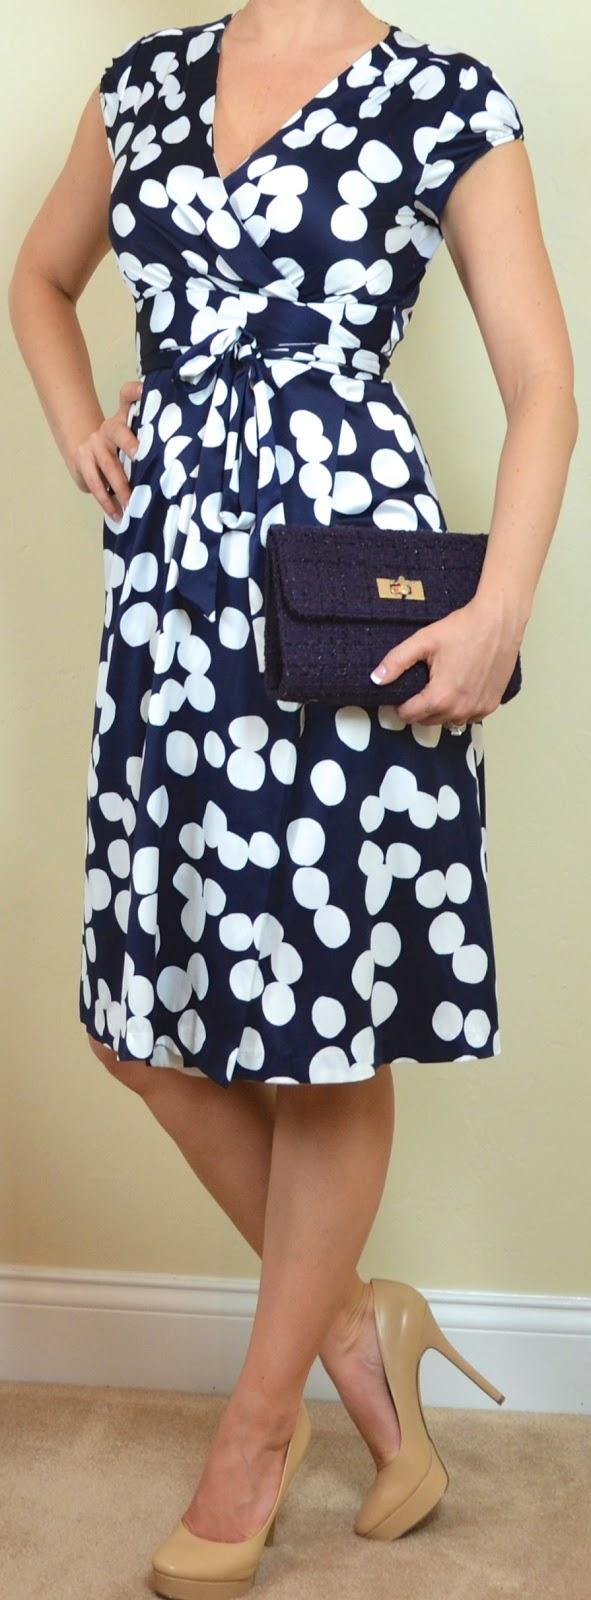 outfit post: navy & white polka dot dress, white cardigan